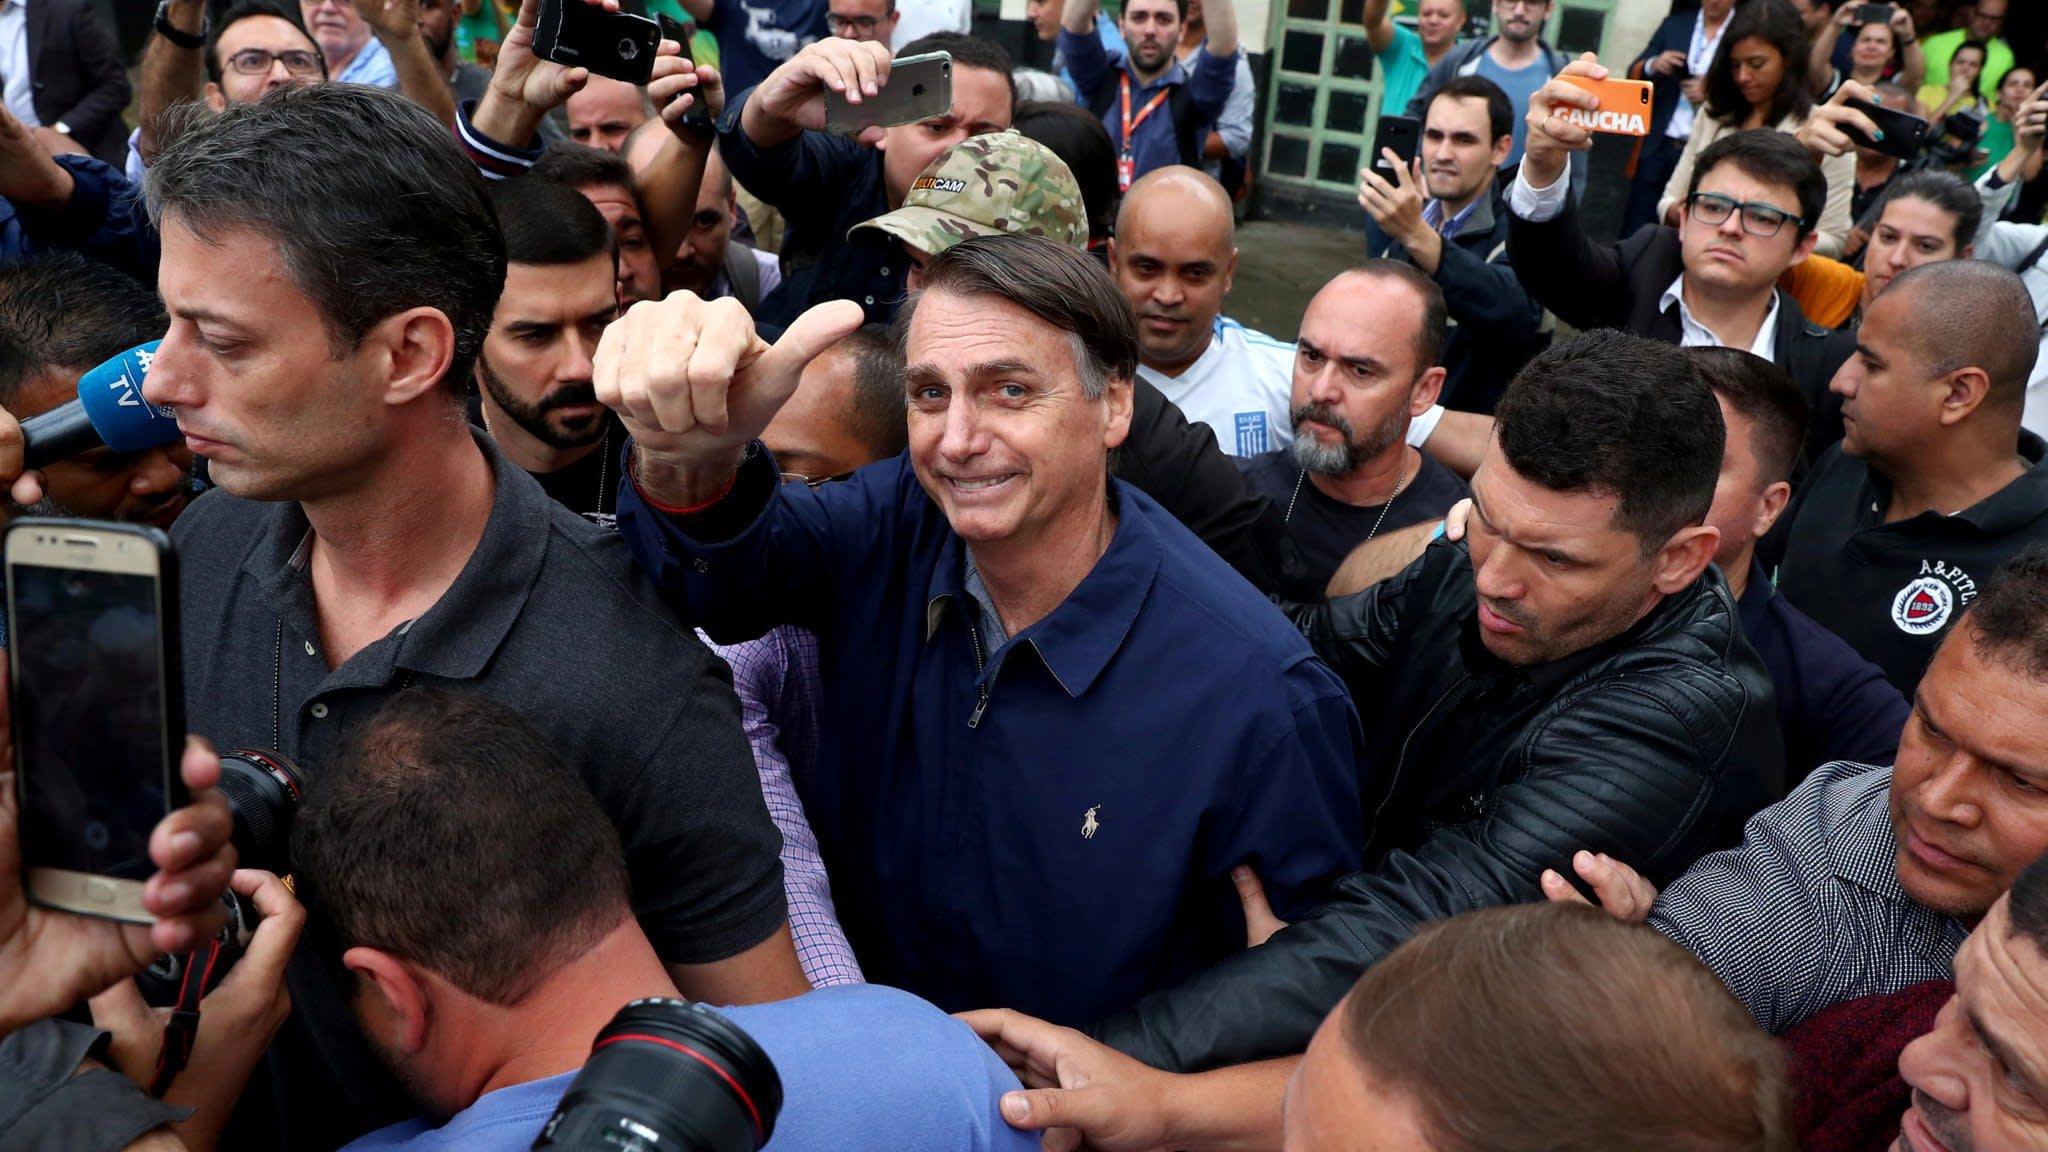 Who is Jair Bolsanaro? Five key facts about Brazil's far-right frontrunner